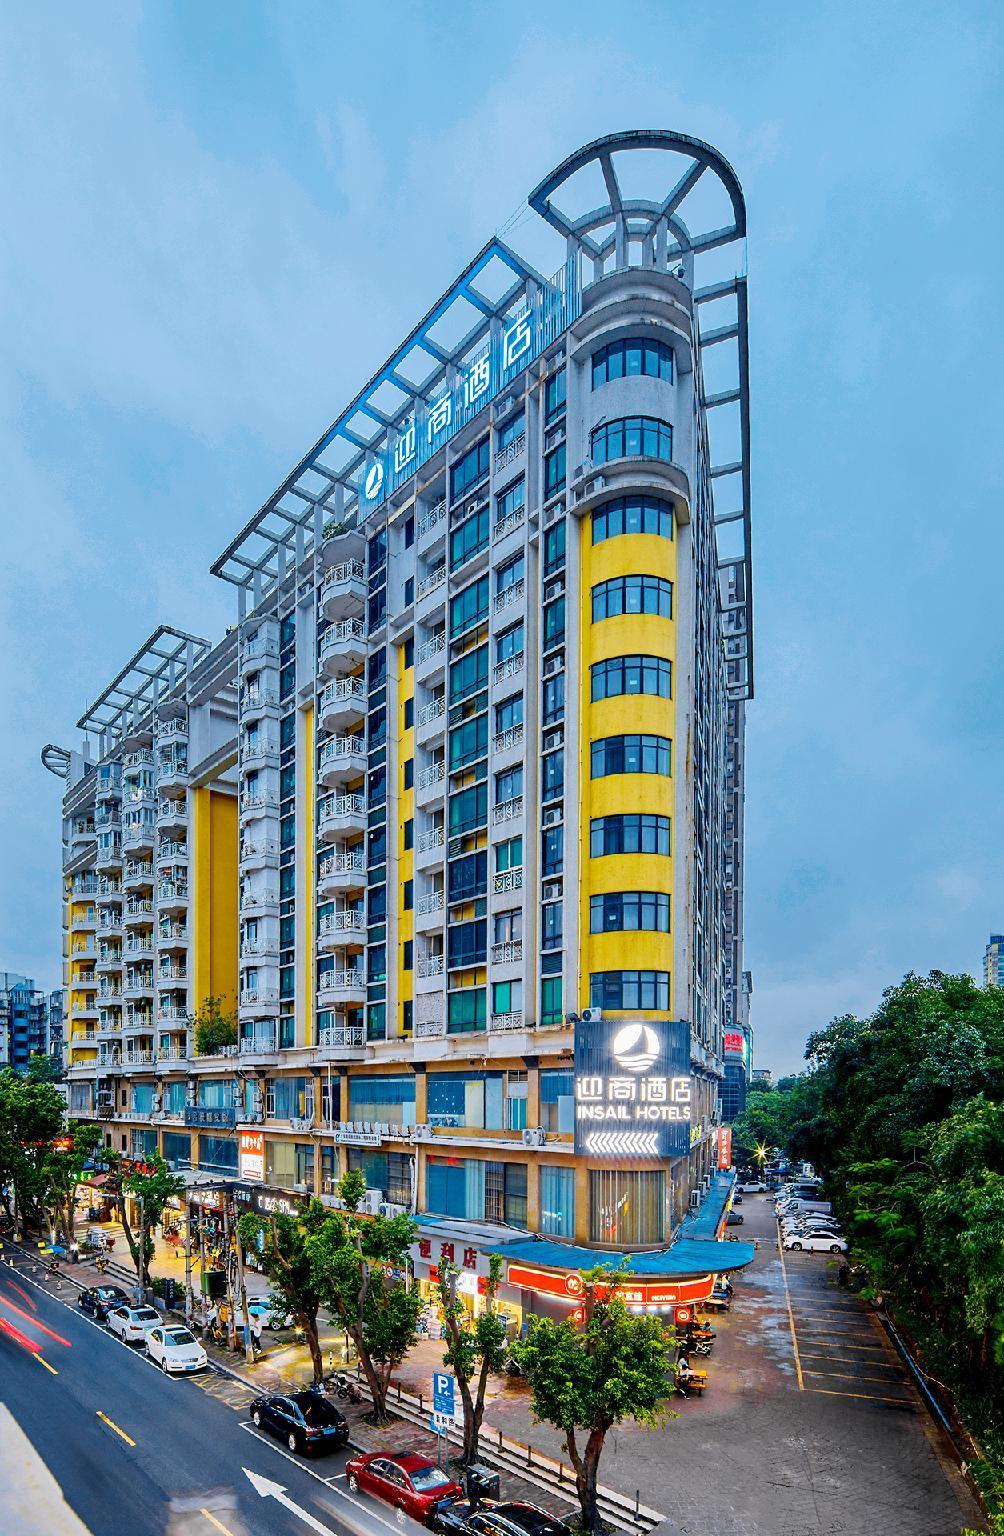 Insail Hotels  Pazhou Exhibition Center KeCun Metro Station Dunhe Road Branch Guangzhou